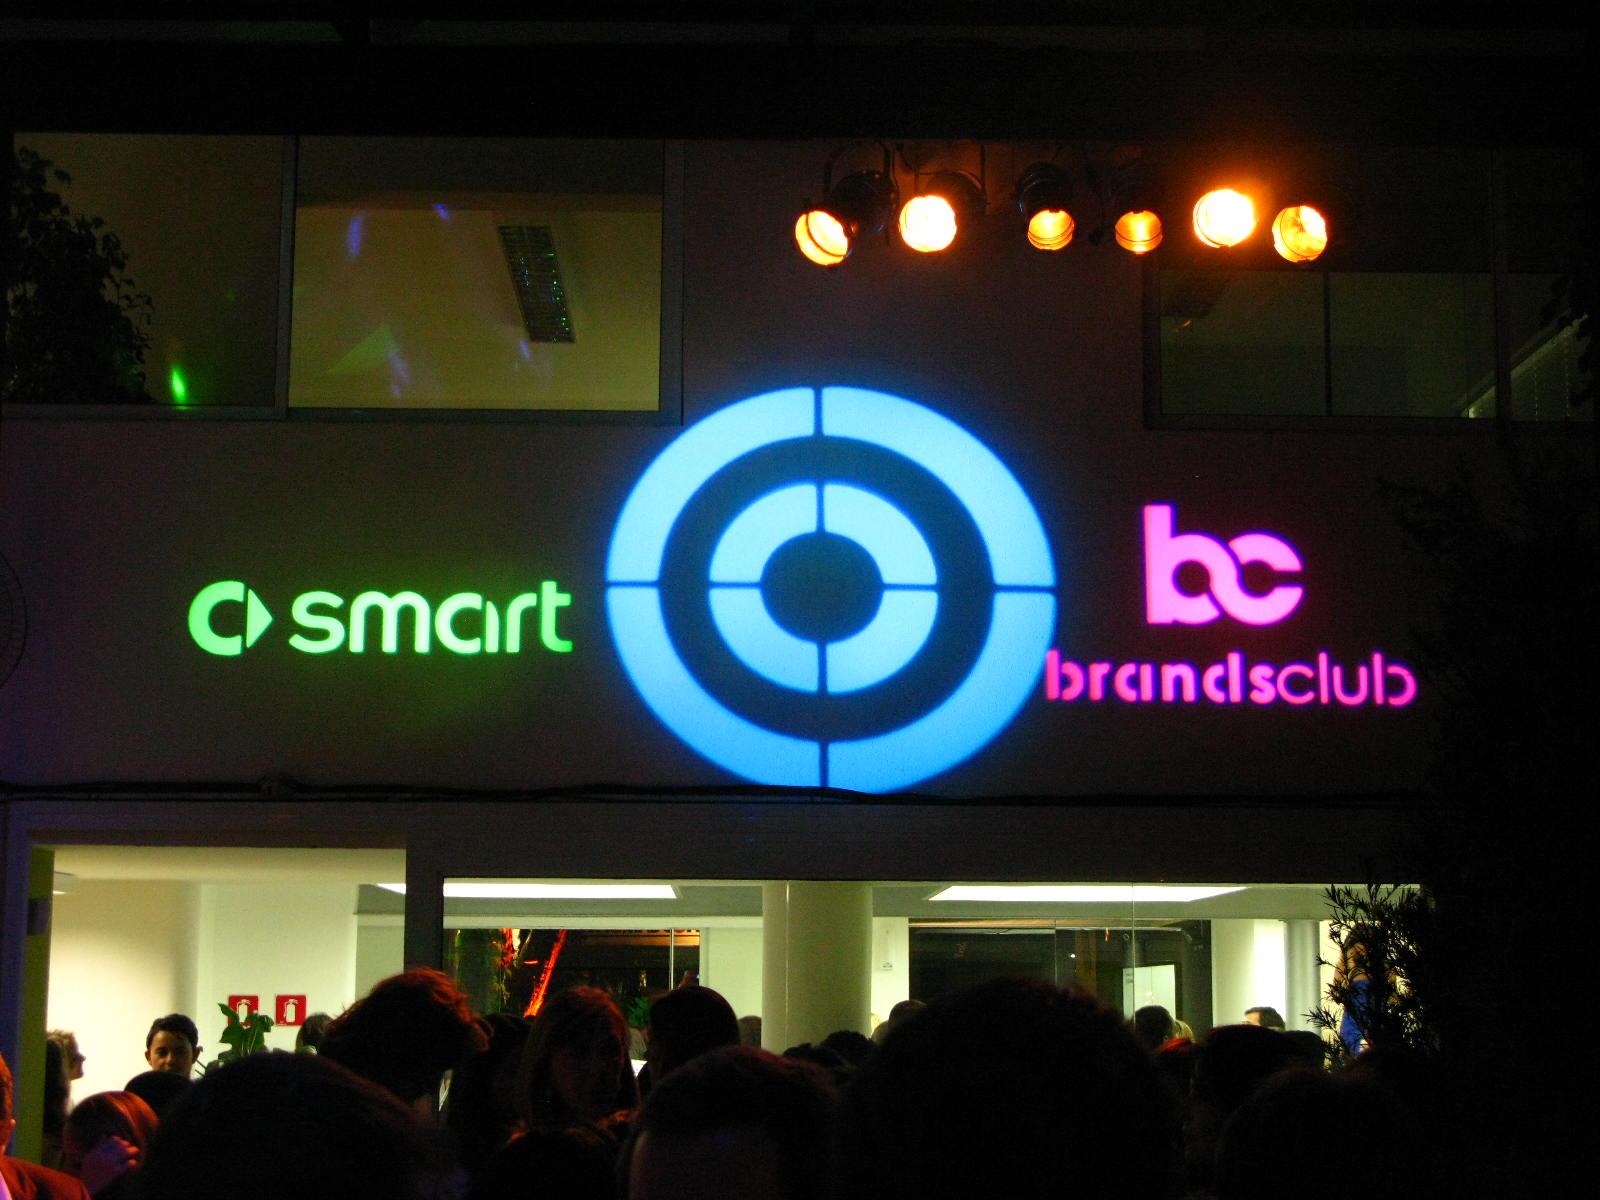 Festa-Brands-Club-Smart.jpg